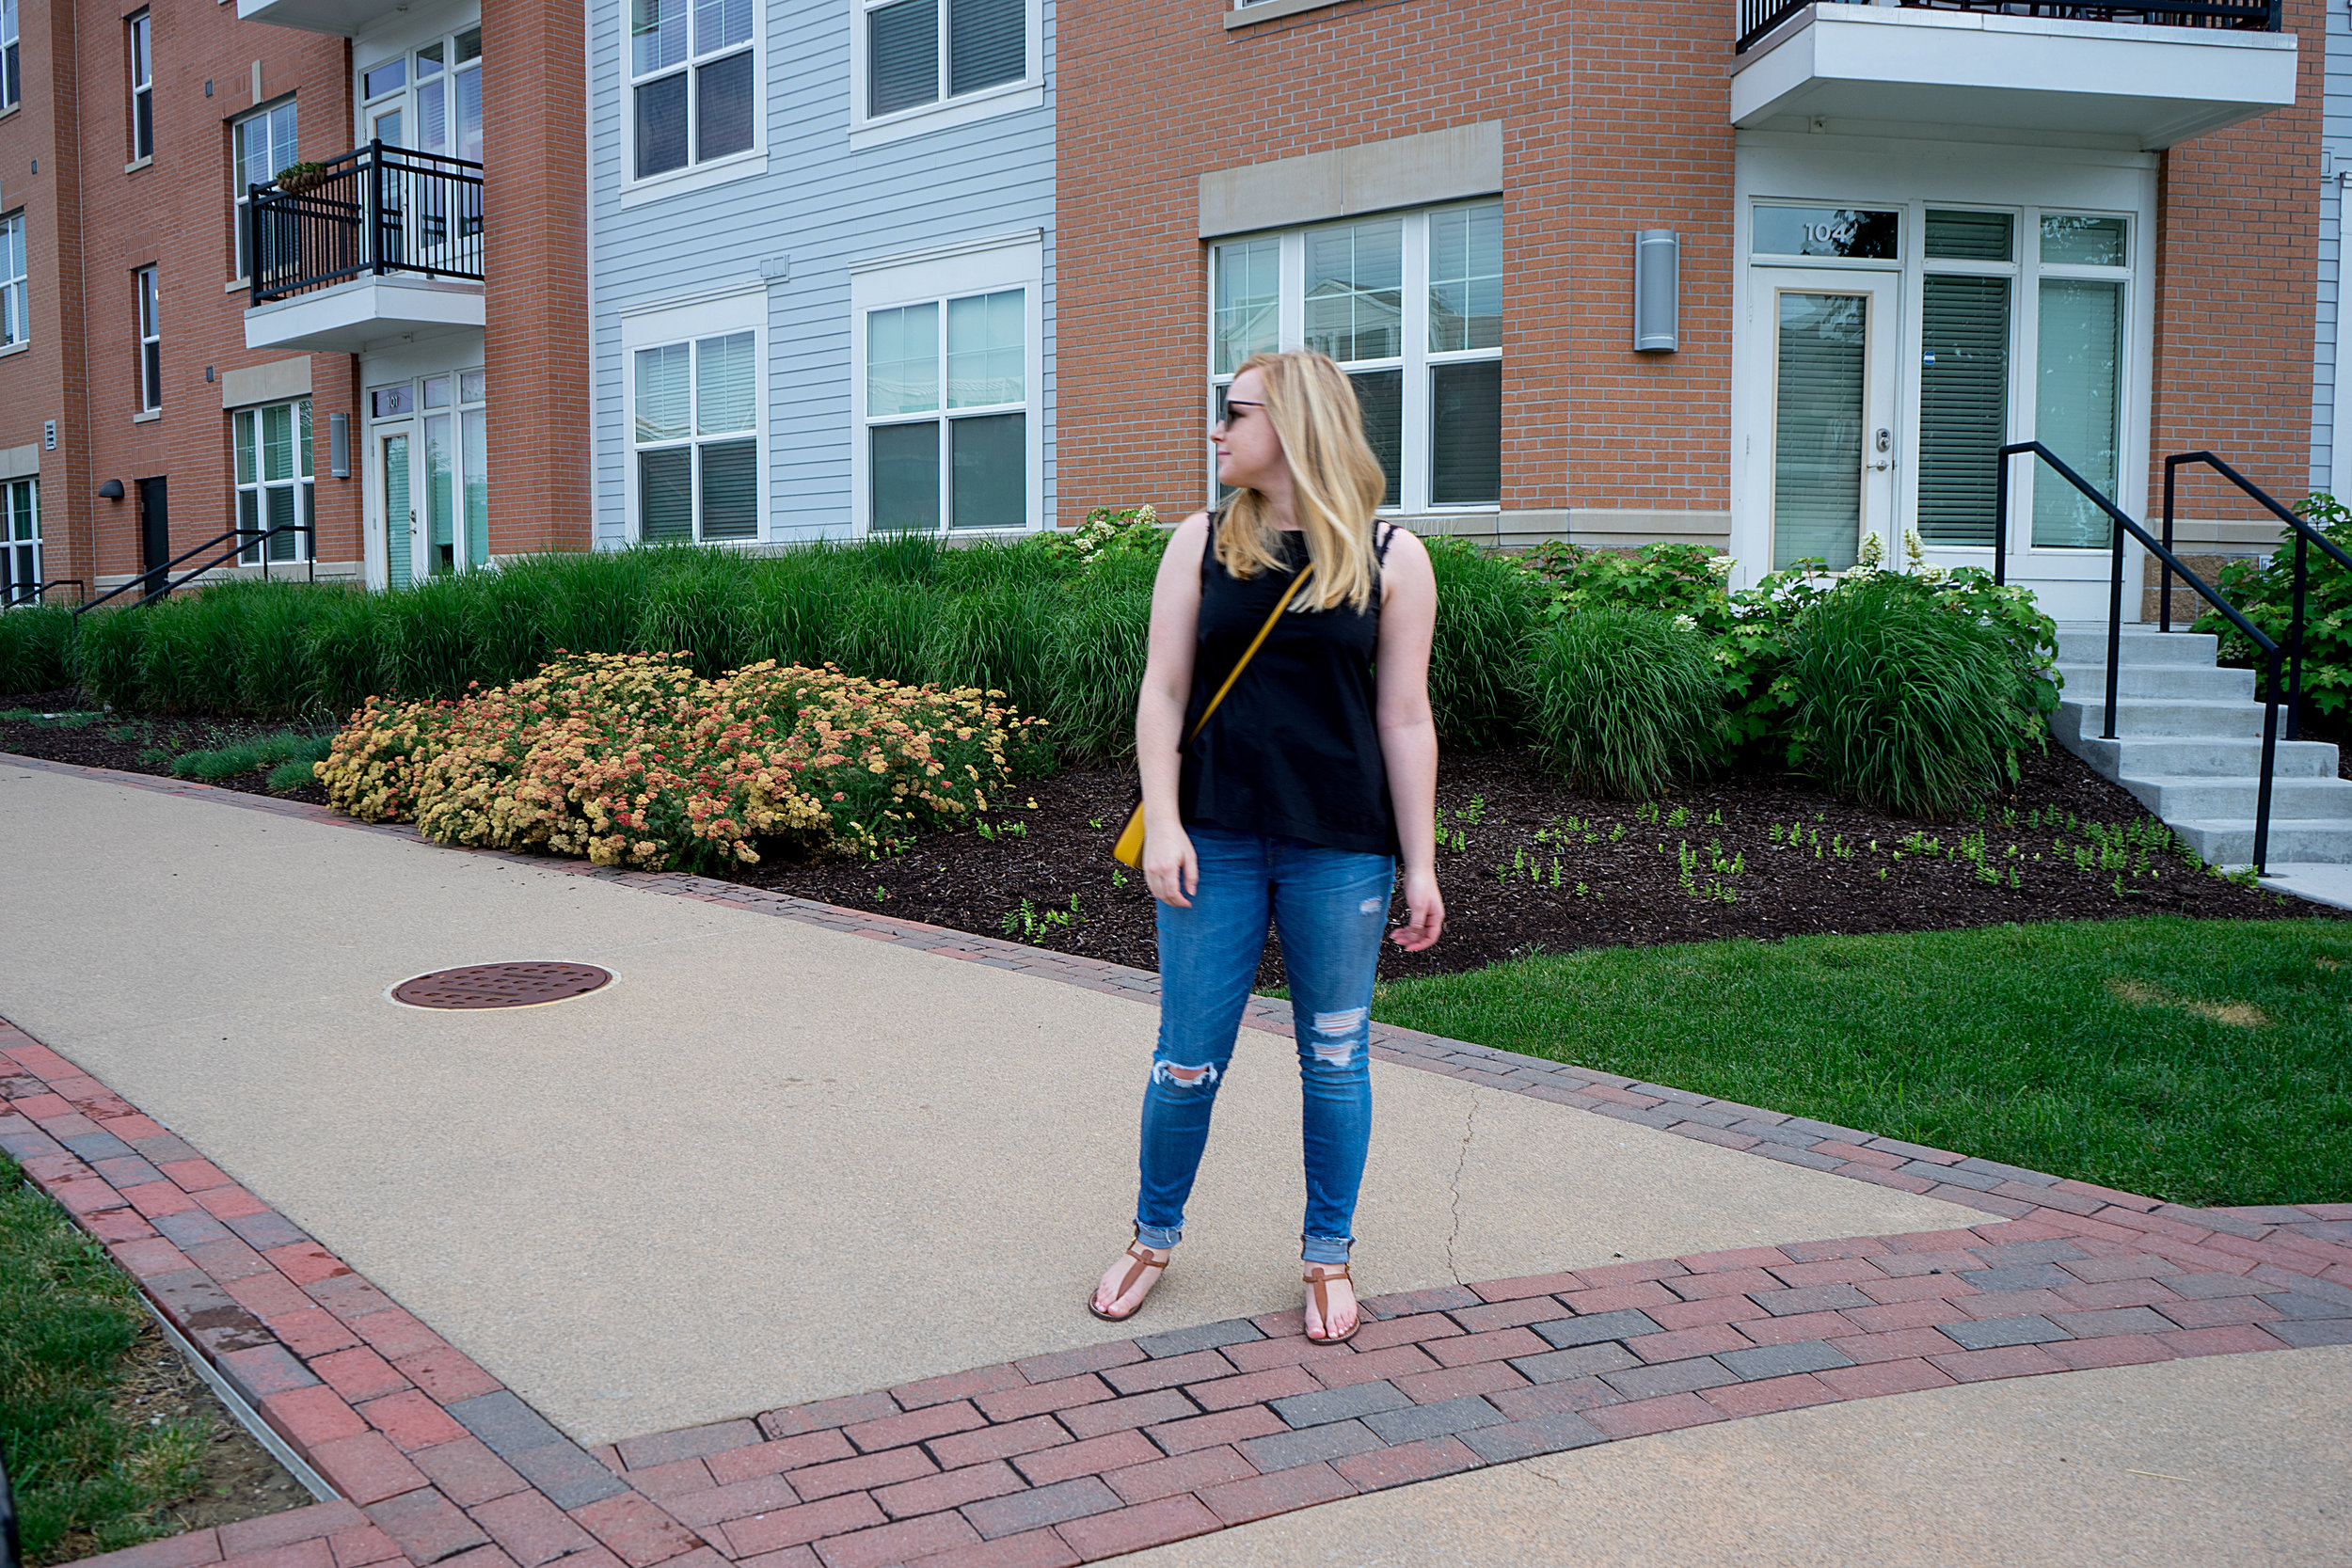 Maggie a la Mode - Ann Taylor LOFT Side Tie Top, Madewell High-Rise Skinny Jeans Drop Hem Edition, Sam Edelman Gigi Sandals, Coach Dinky crossbody purse